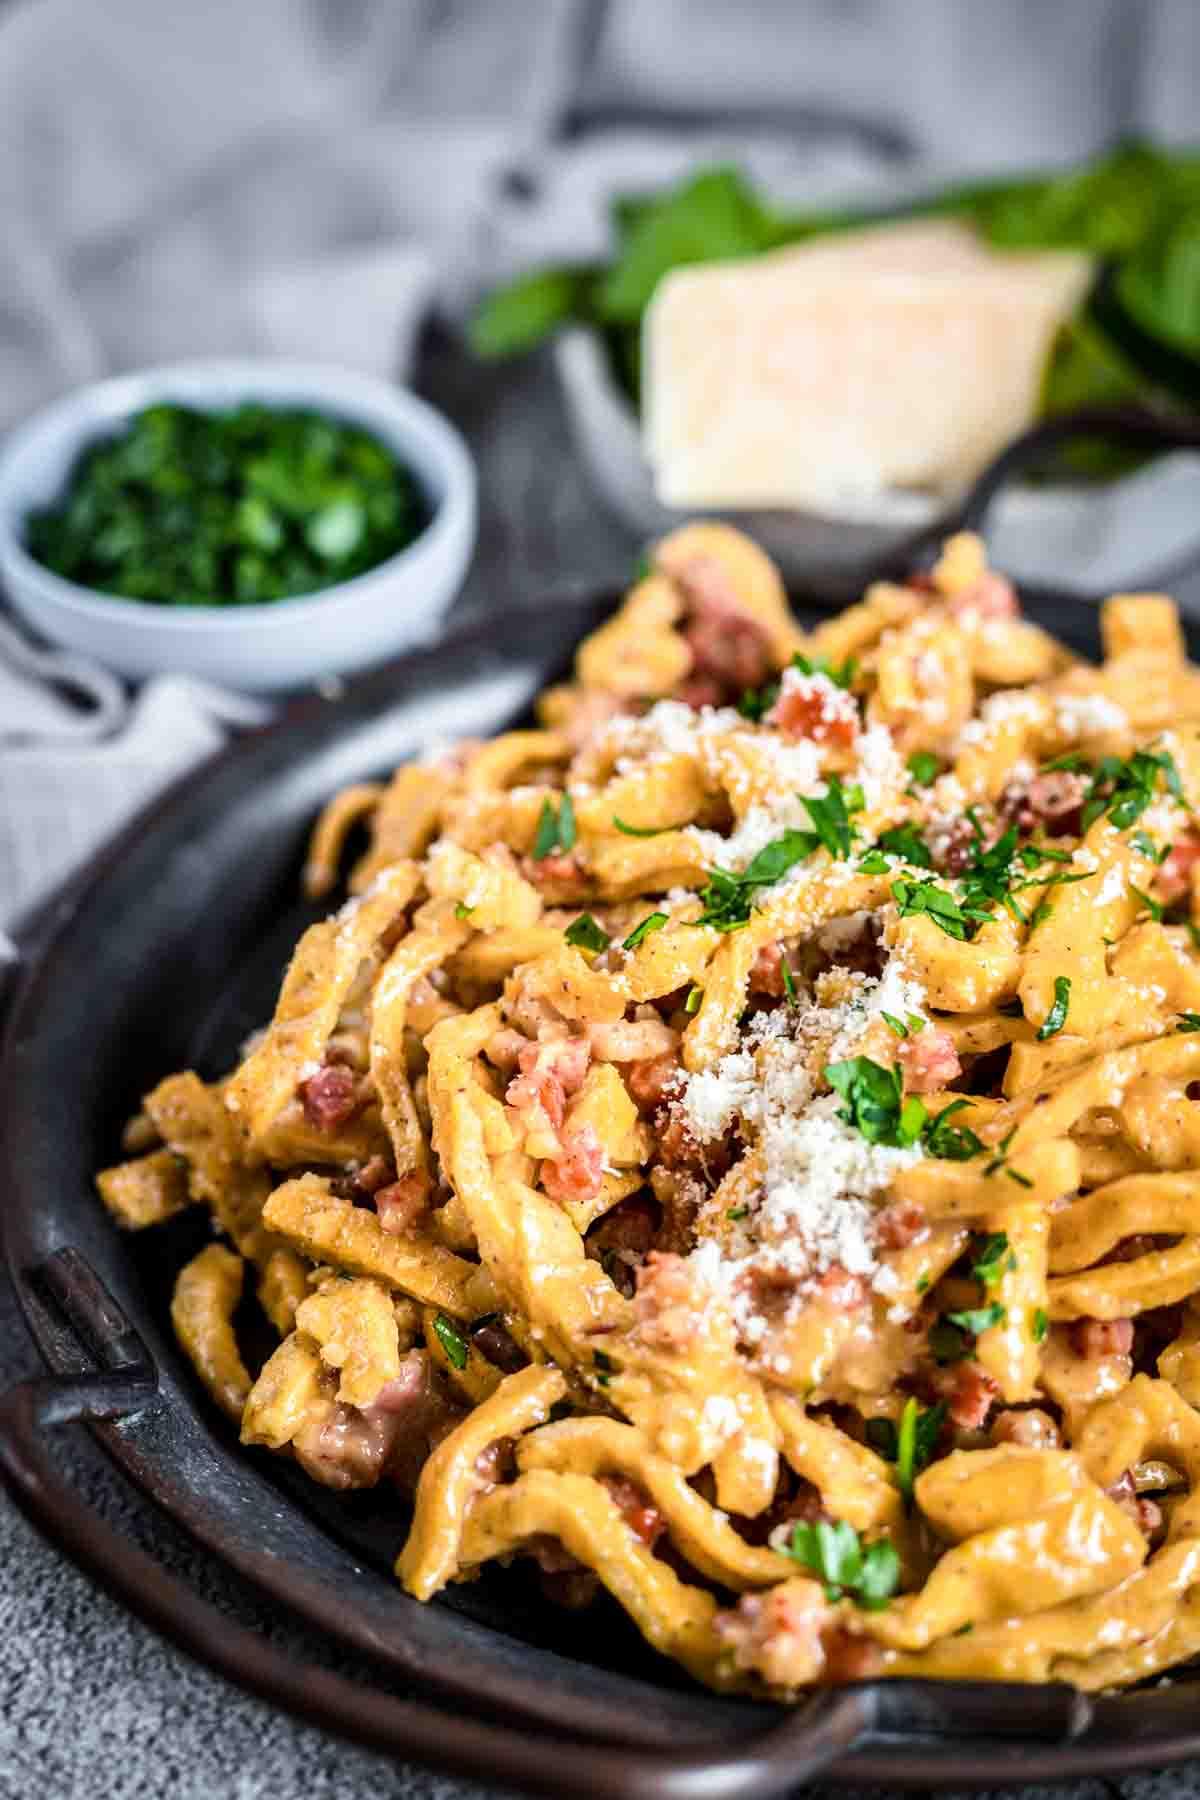 Keto Pasta Carbonara Recipe served on a dark plate